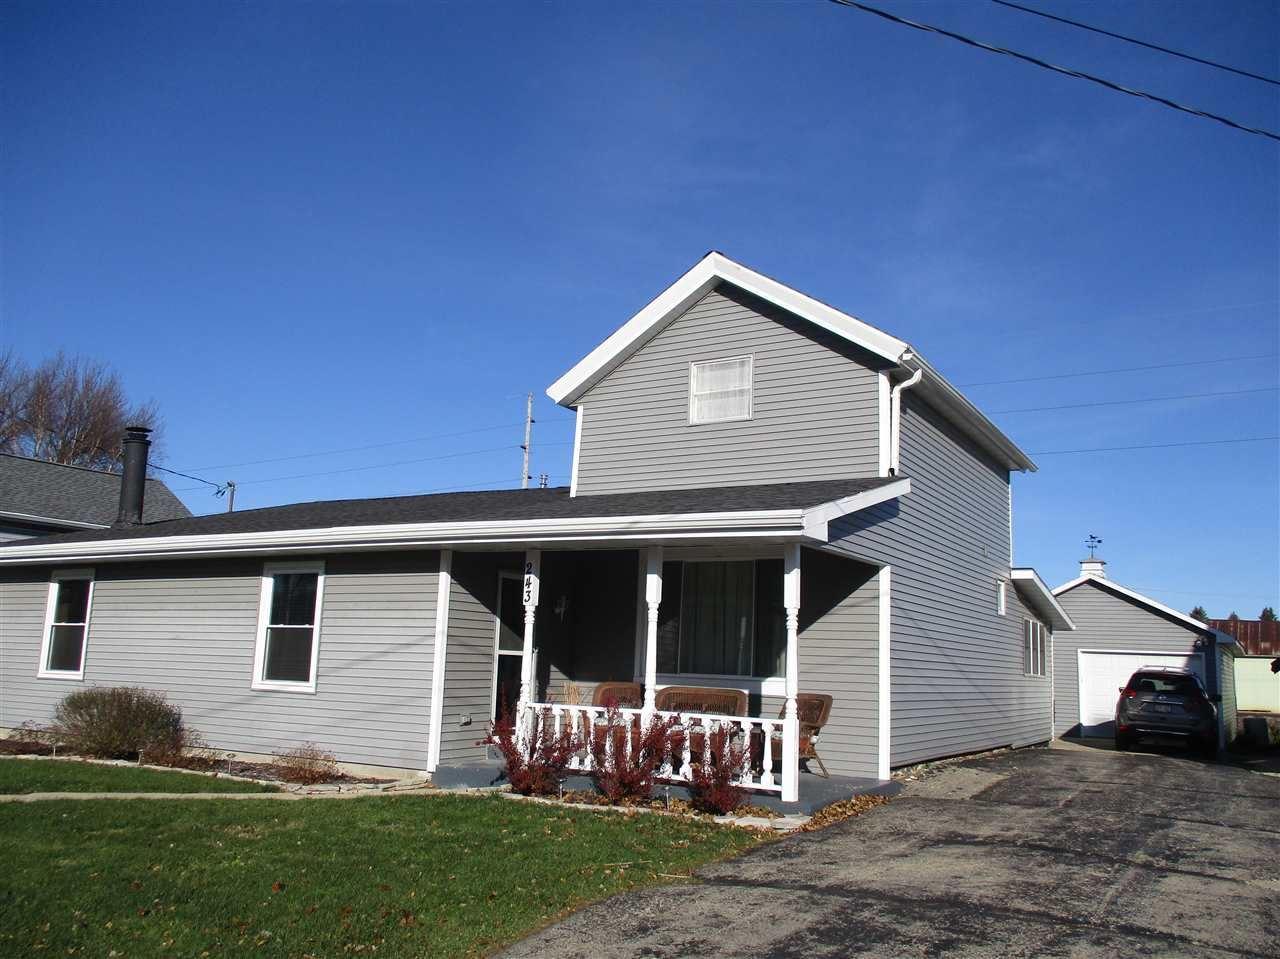 243 Center St, Randolph, WI 53956 - #: 1898100